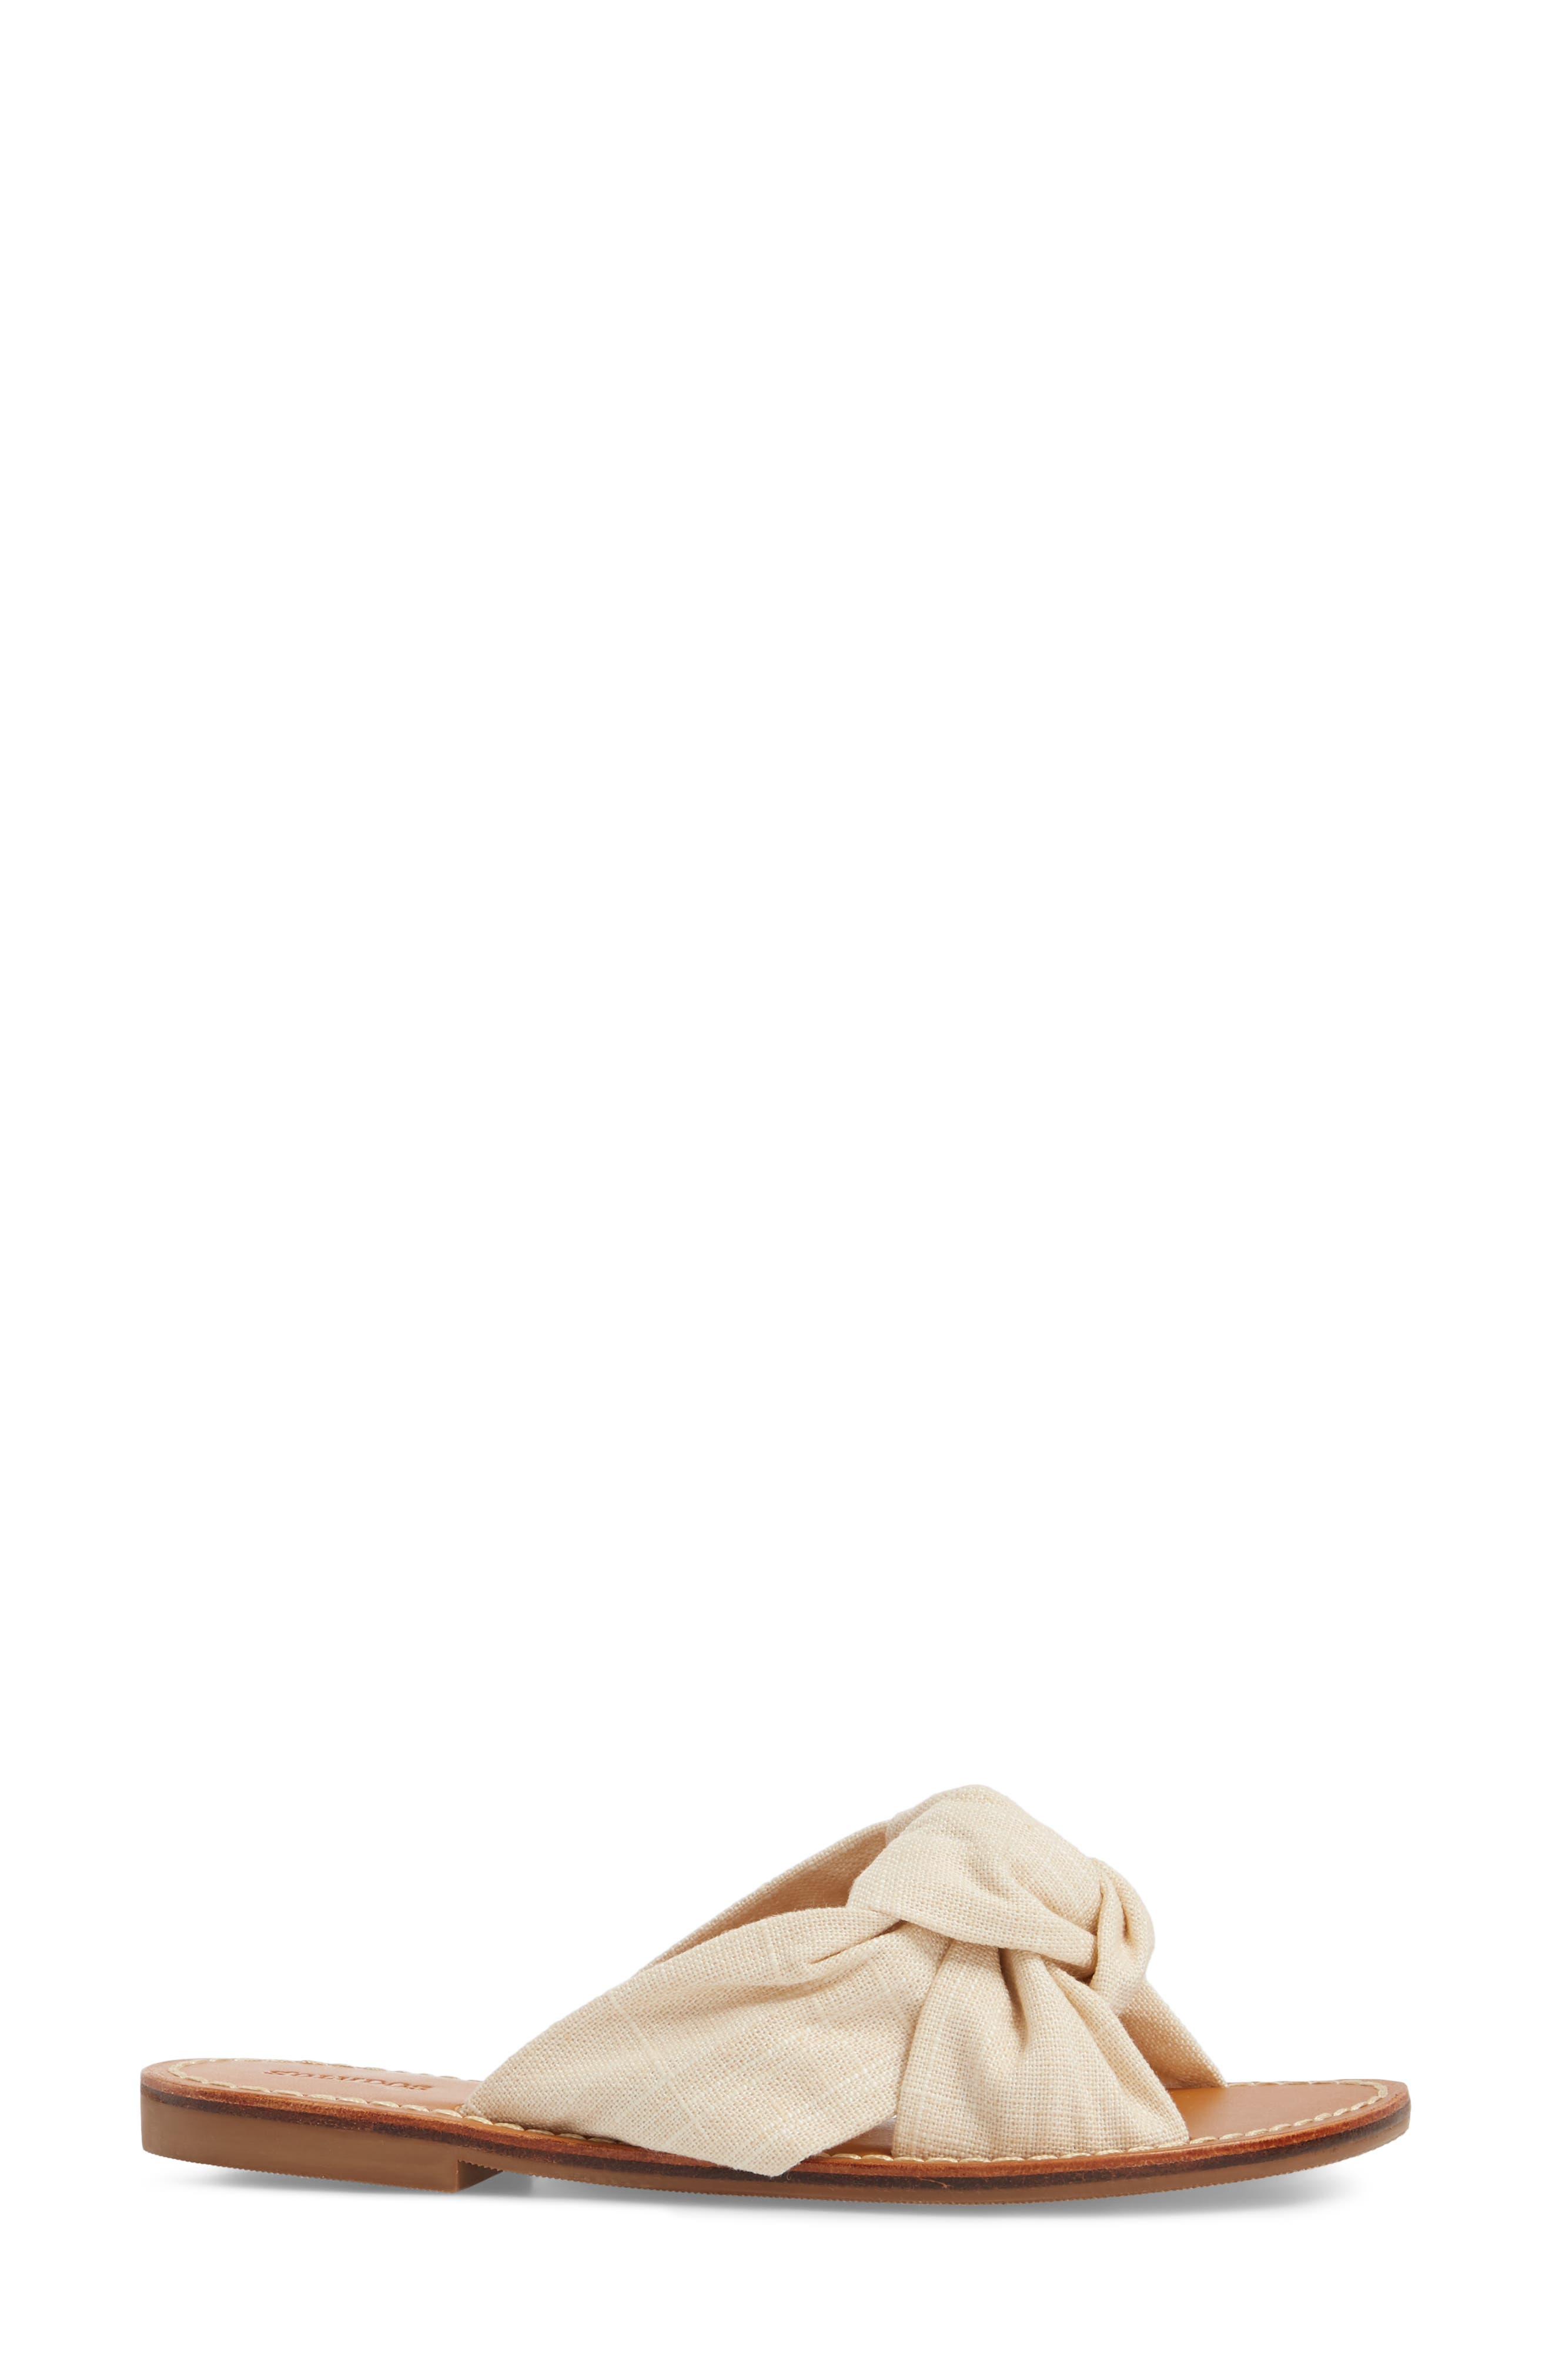 Knotted Slide Sandal,                             Alternate thumbnail 3, color,                             Blush Fabric